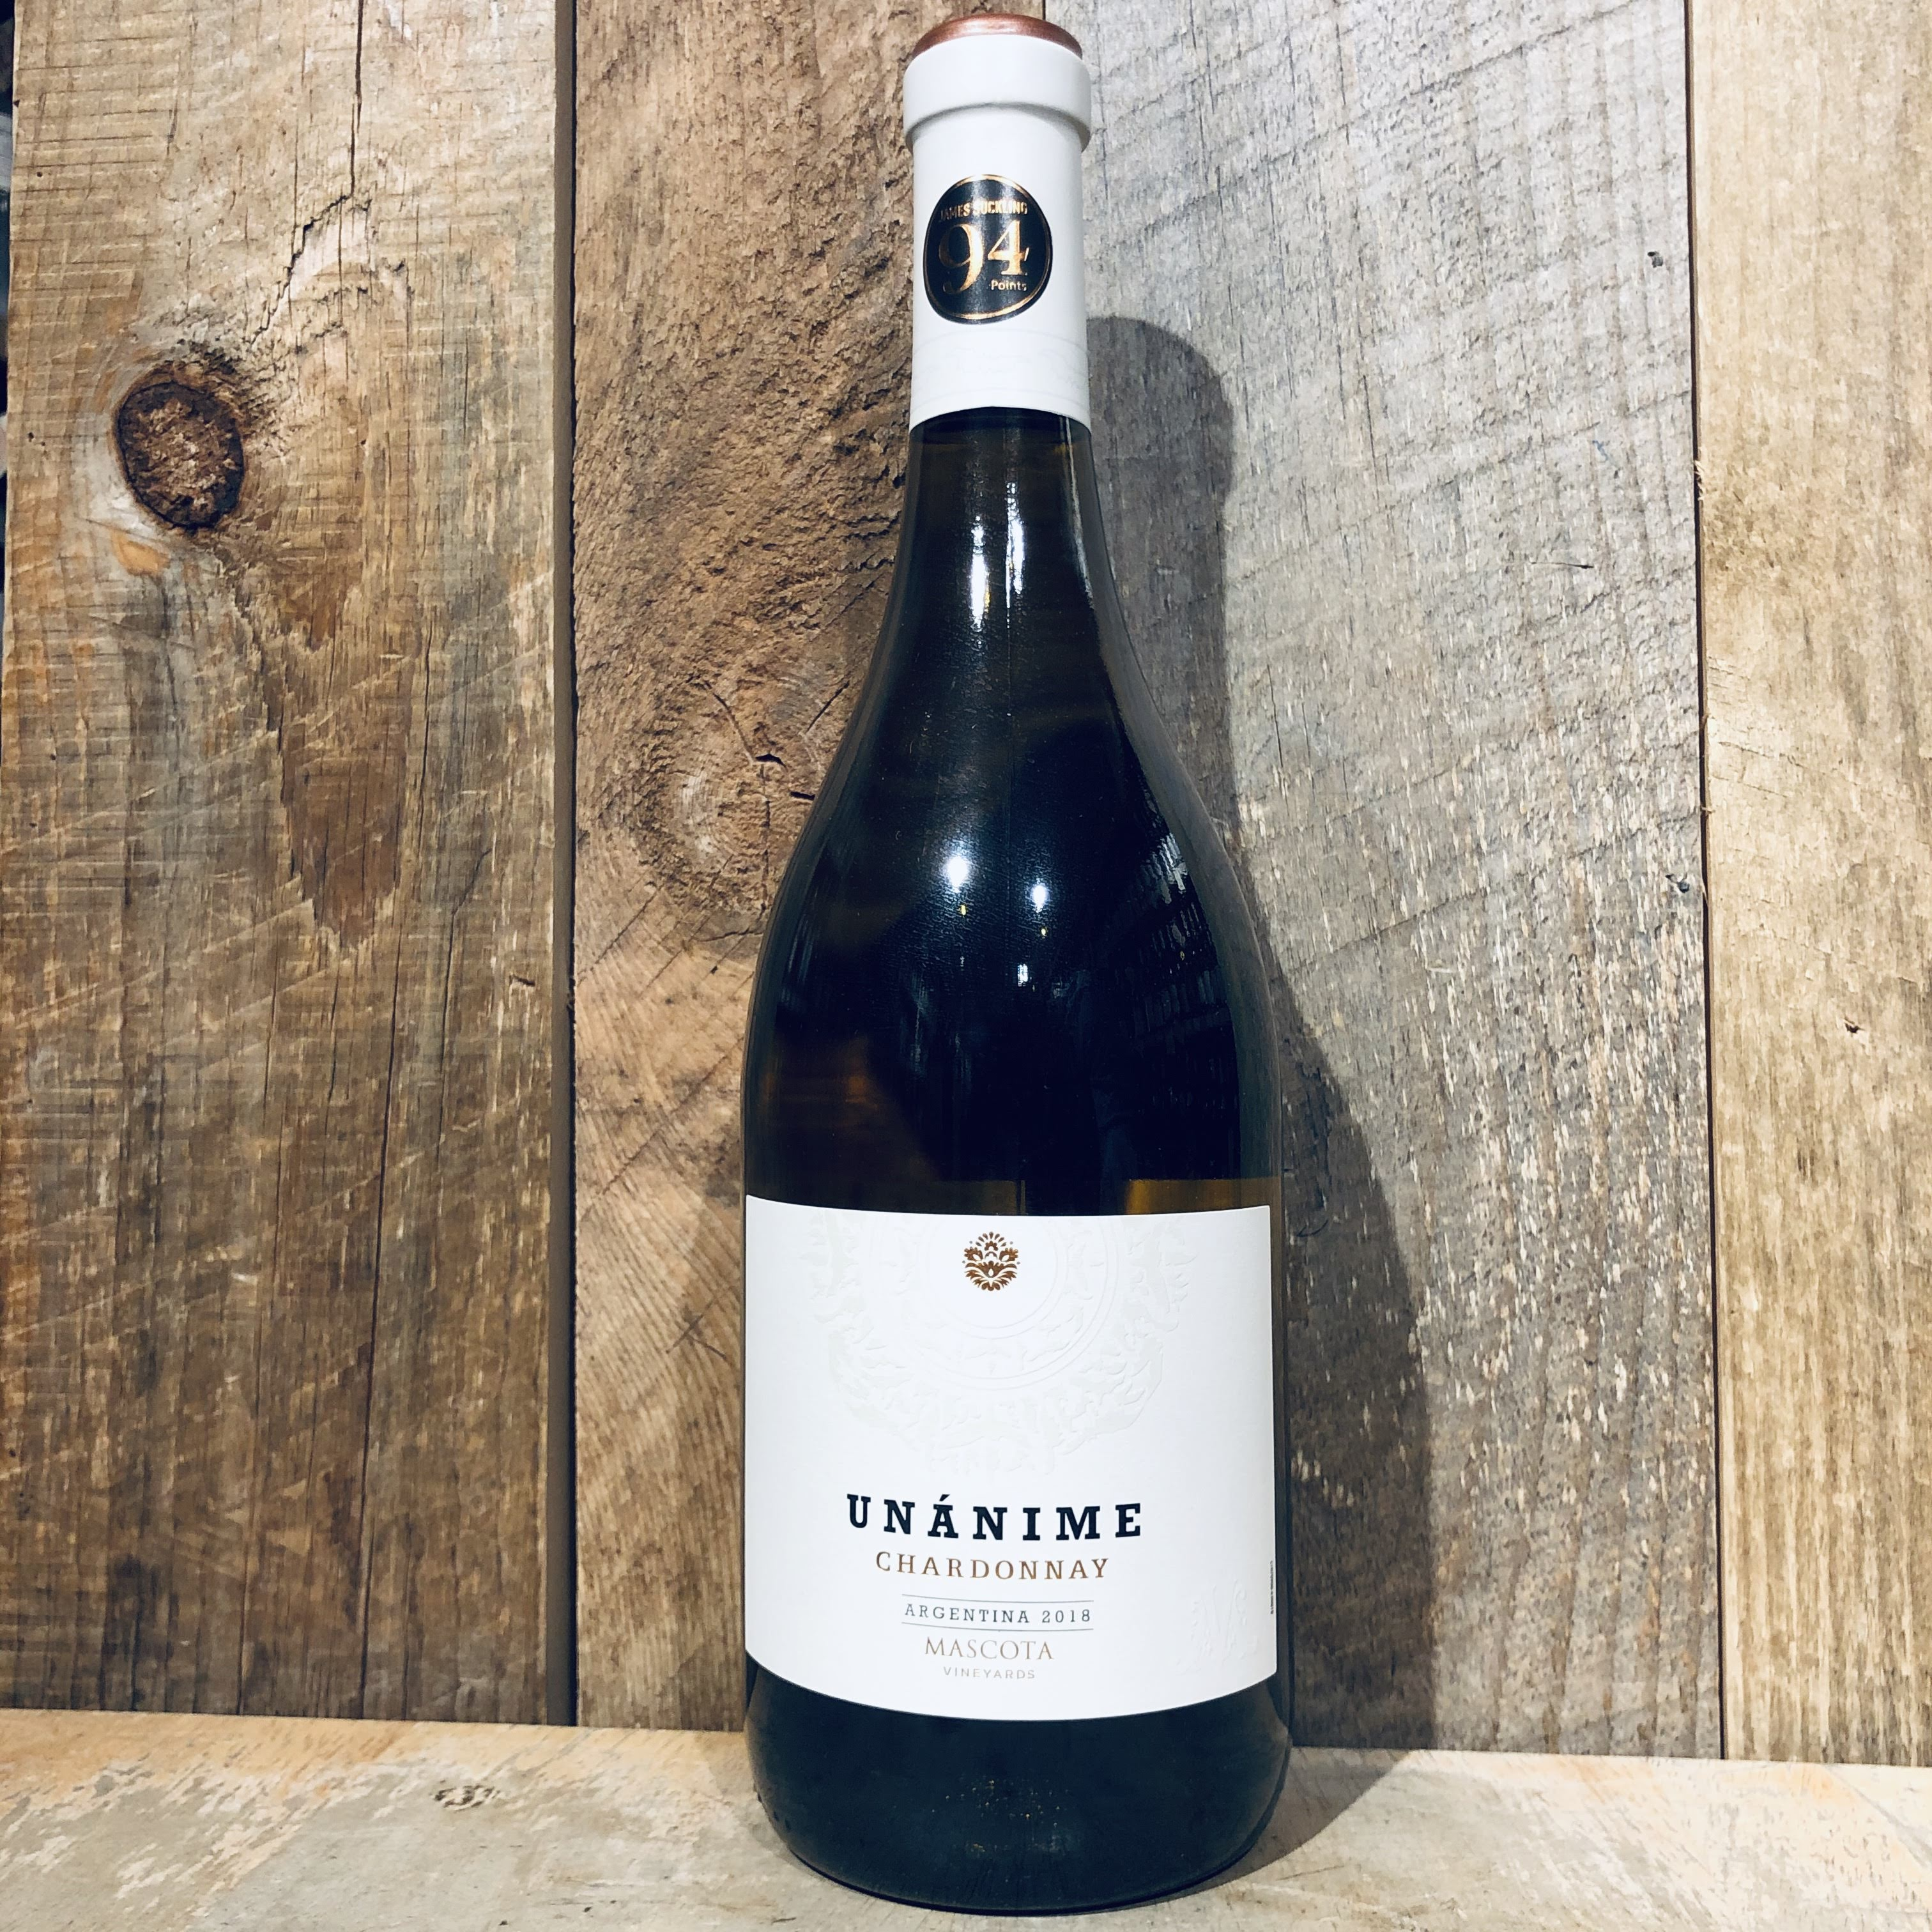 Mascota Vineyards Unanime Chardonnay 750ml